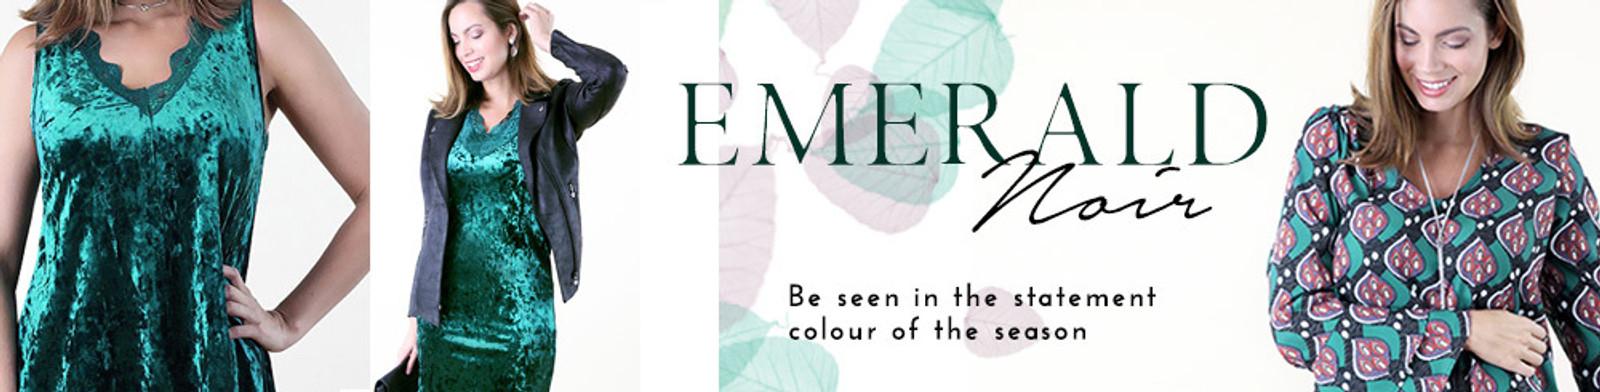 Emerald Noir Edit